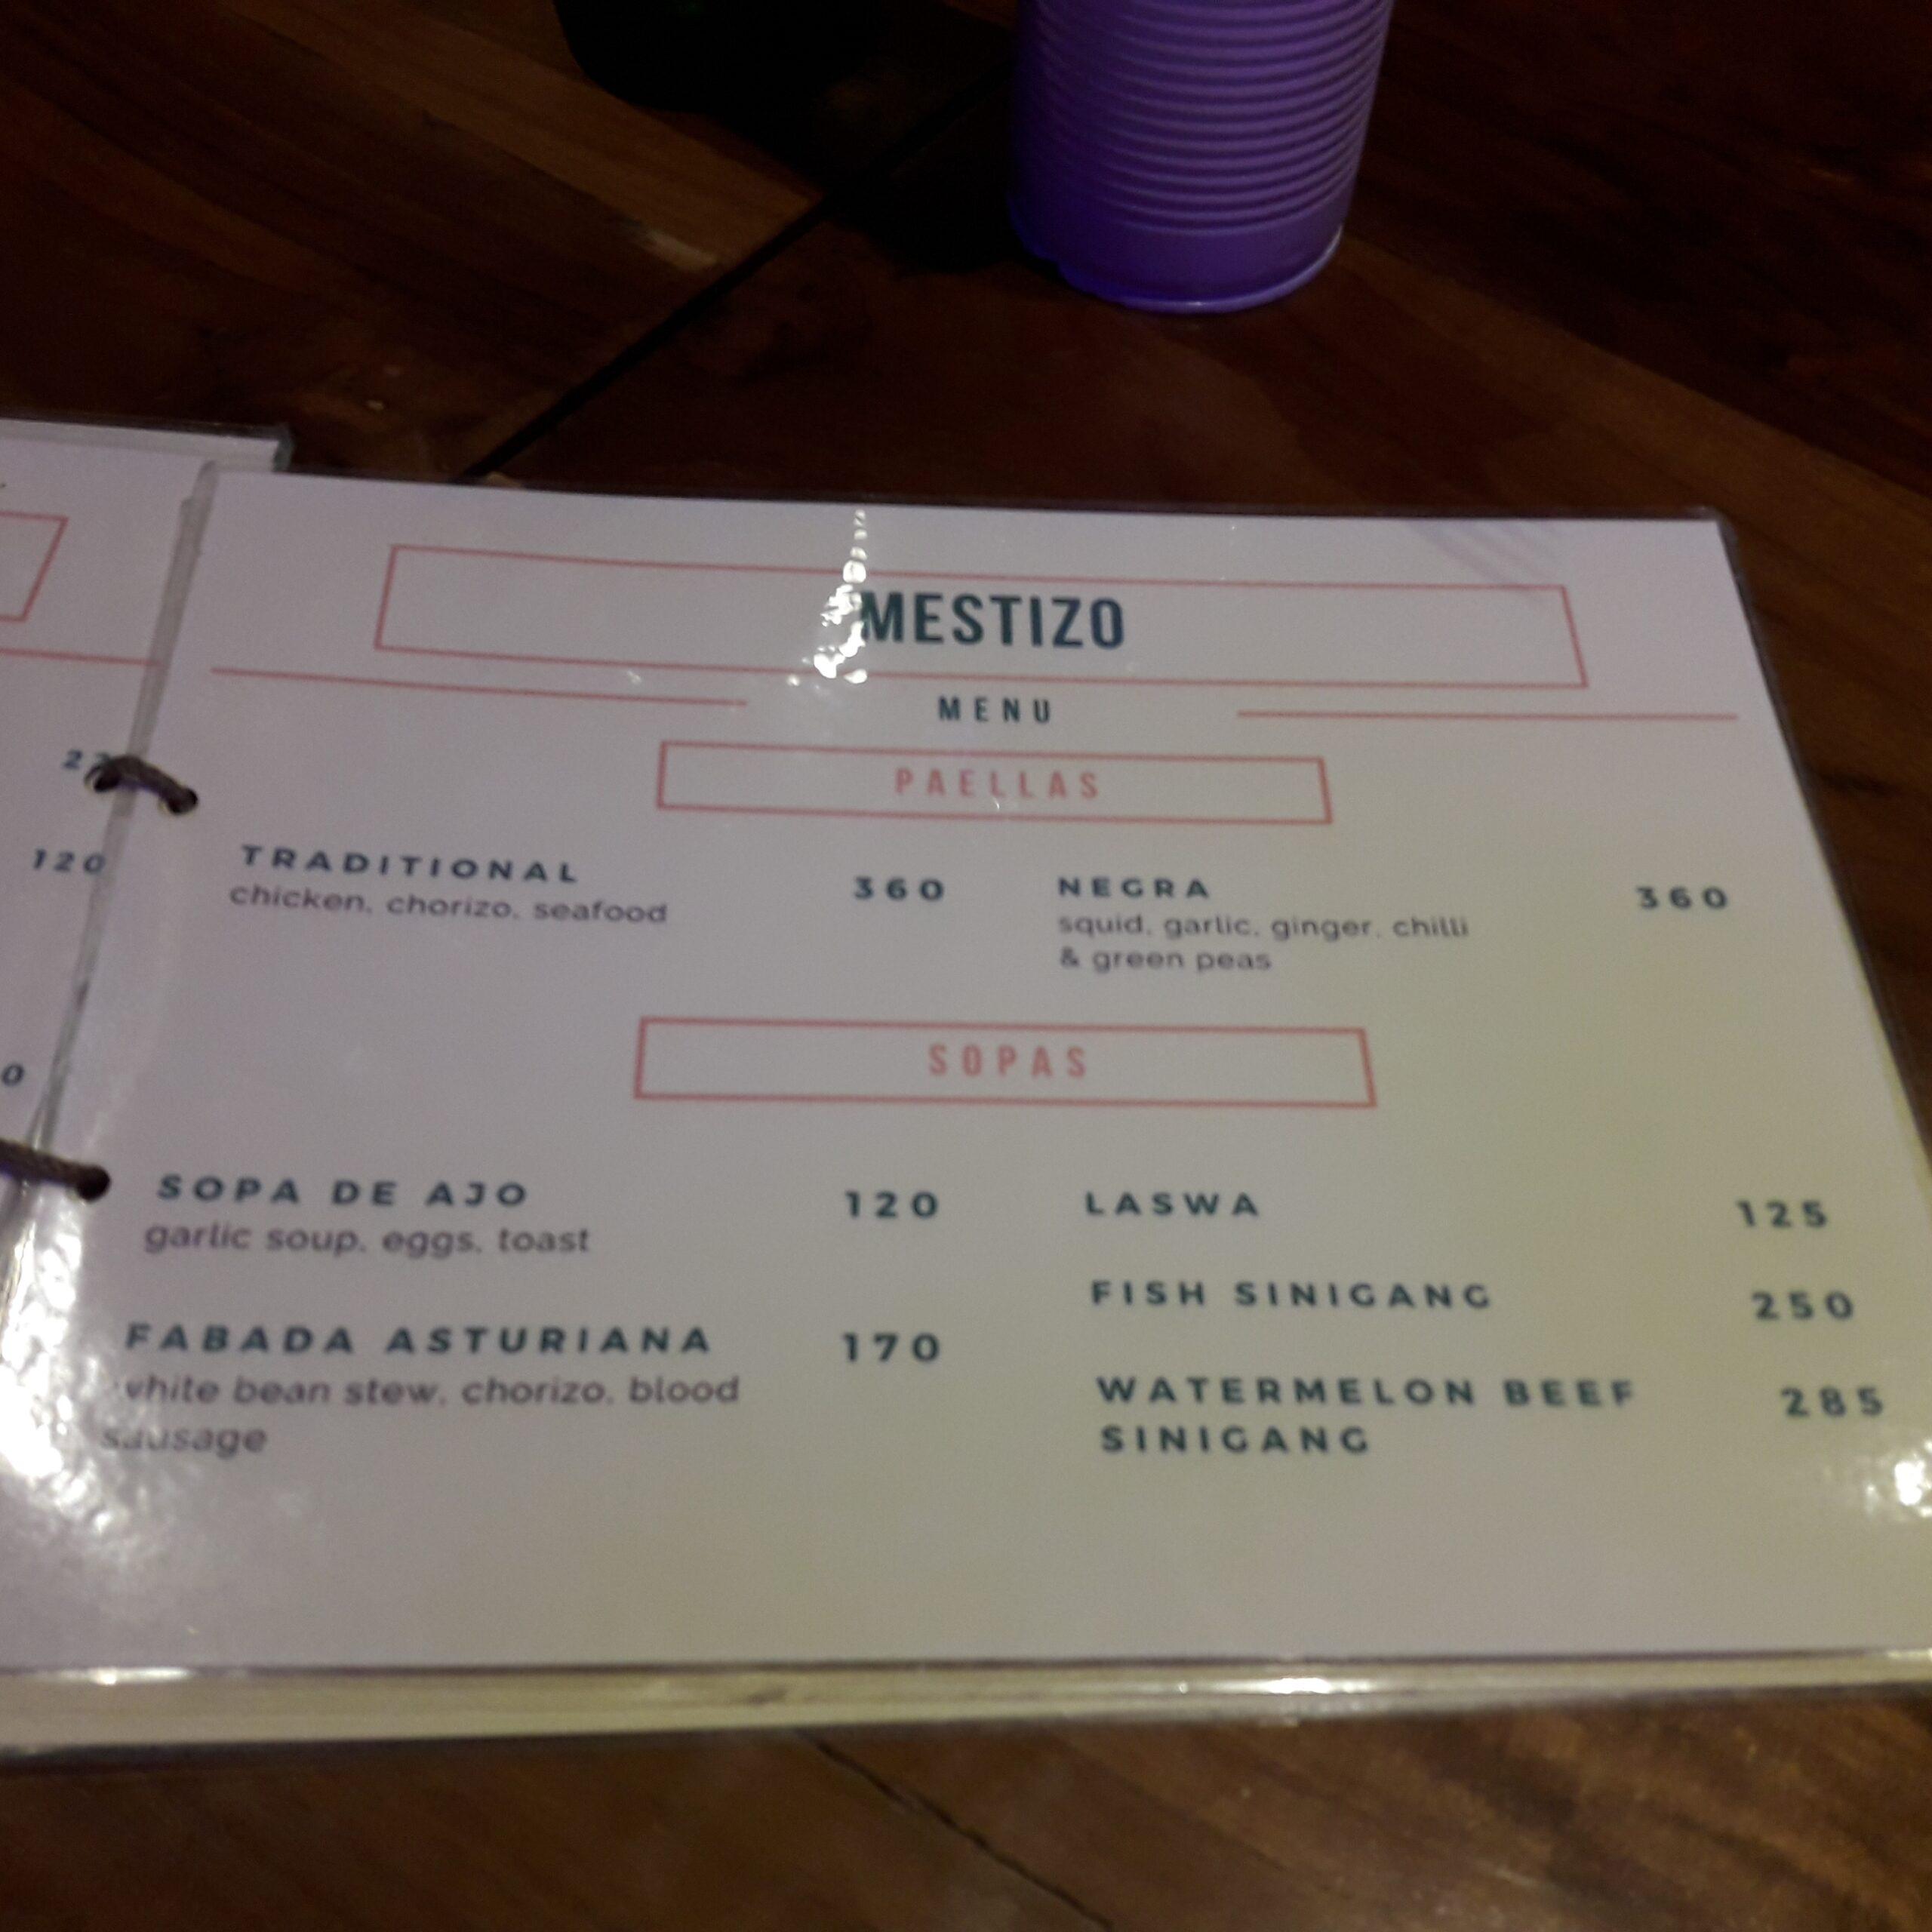 Mestizo menu paella